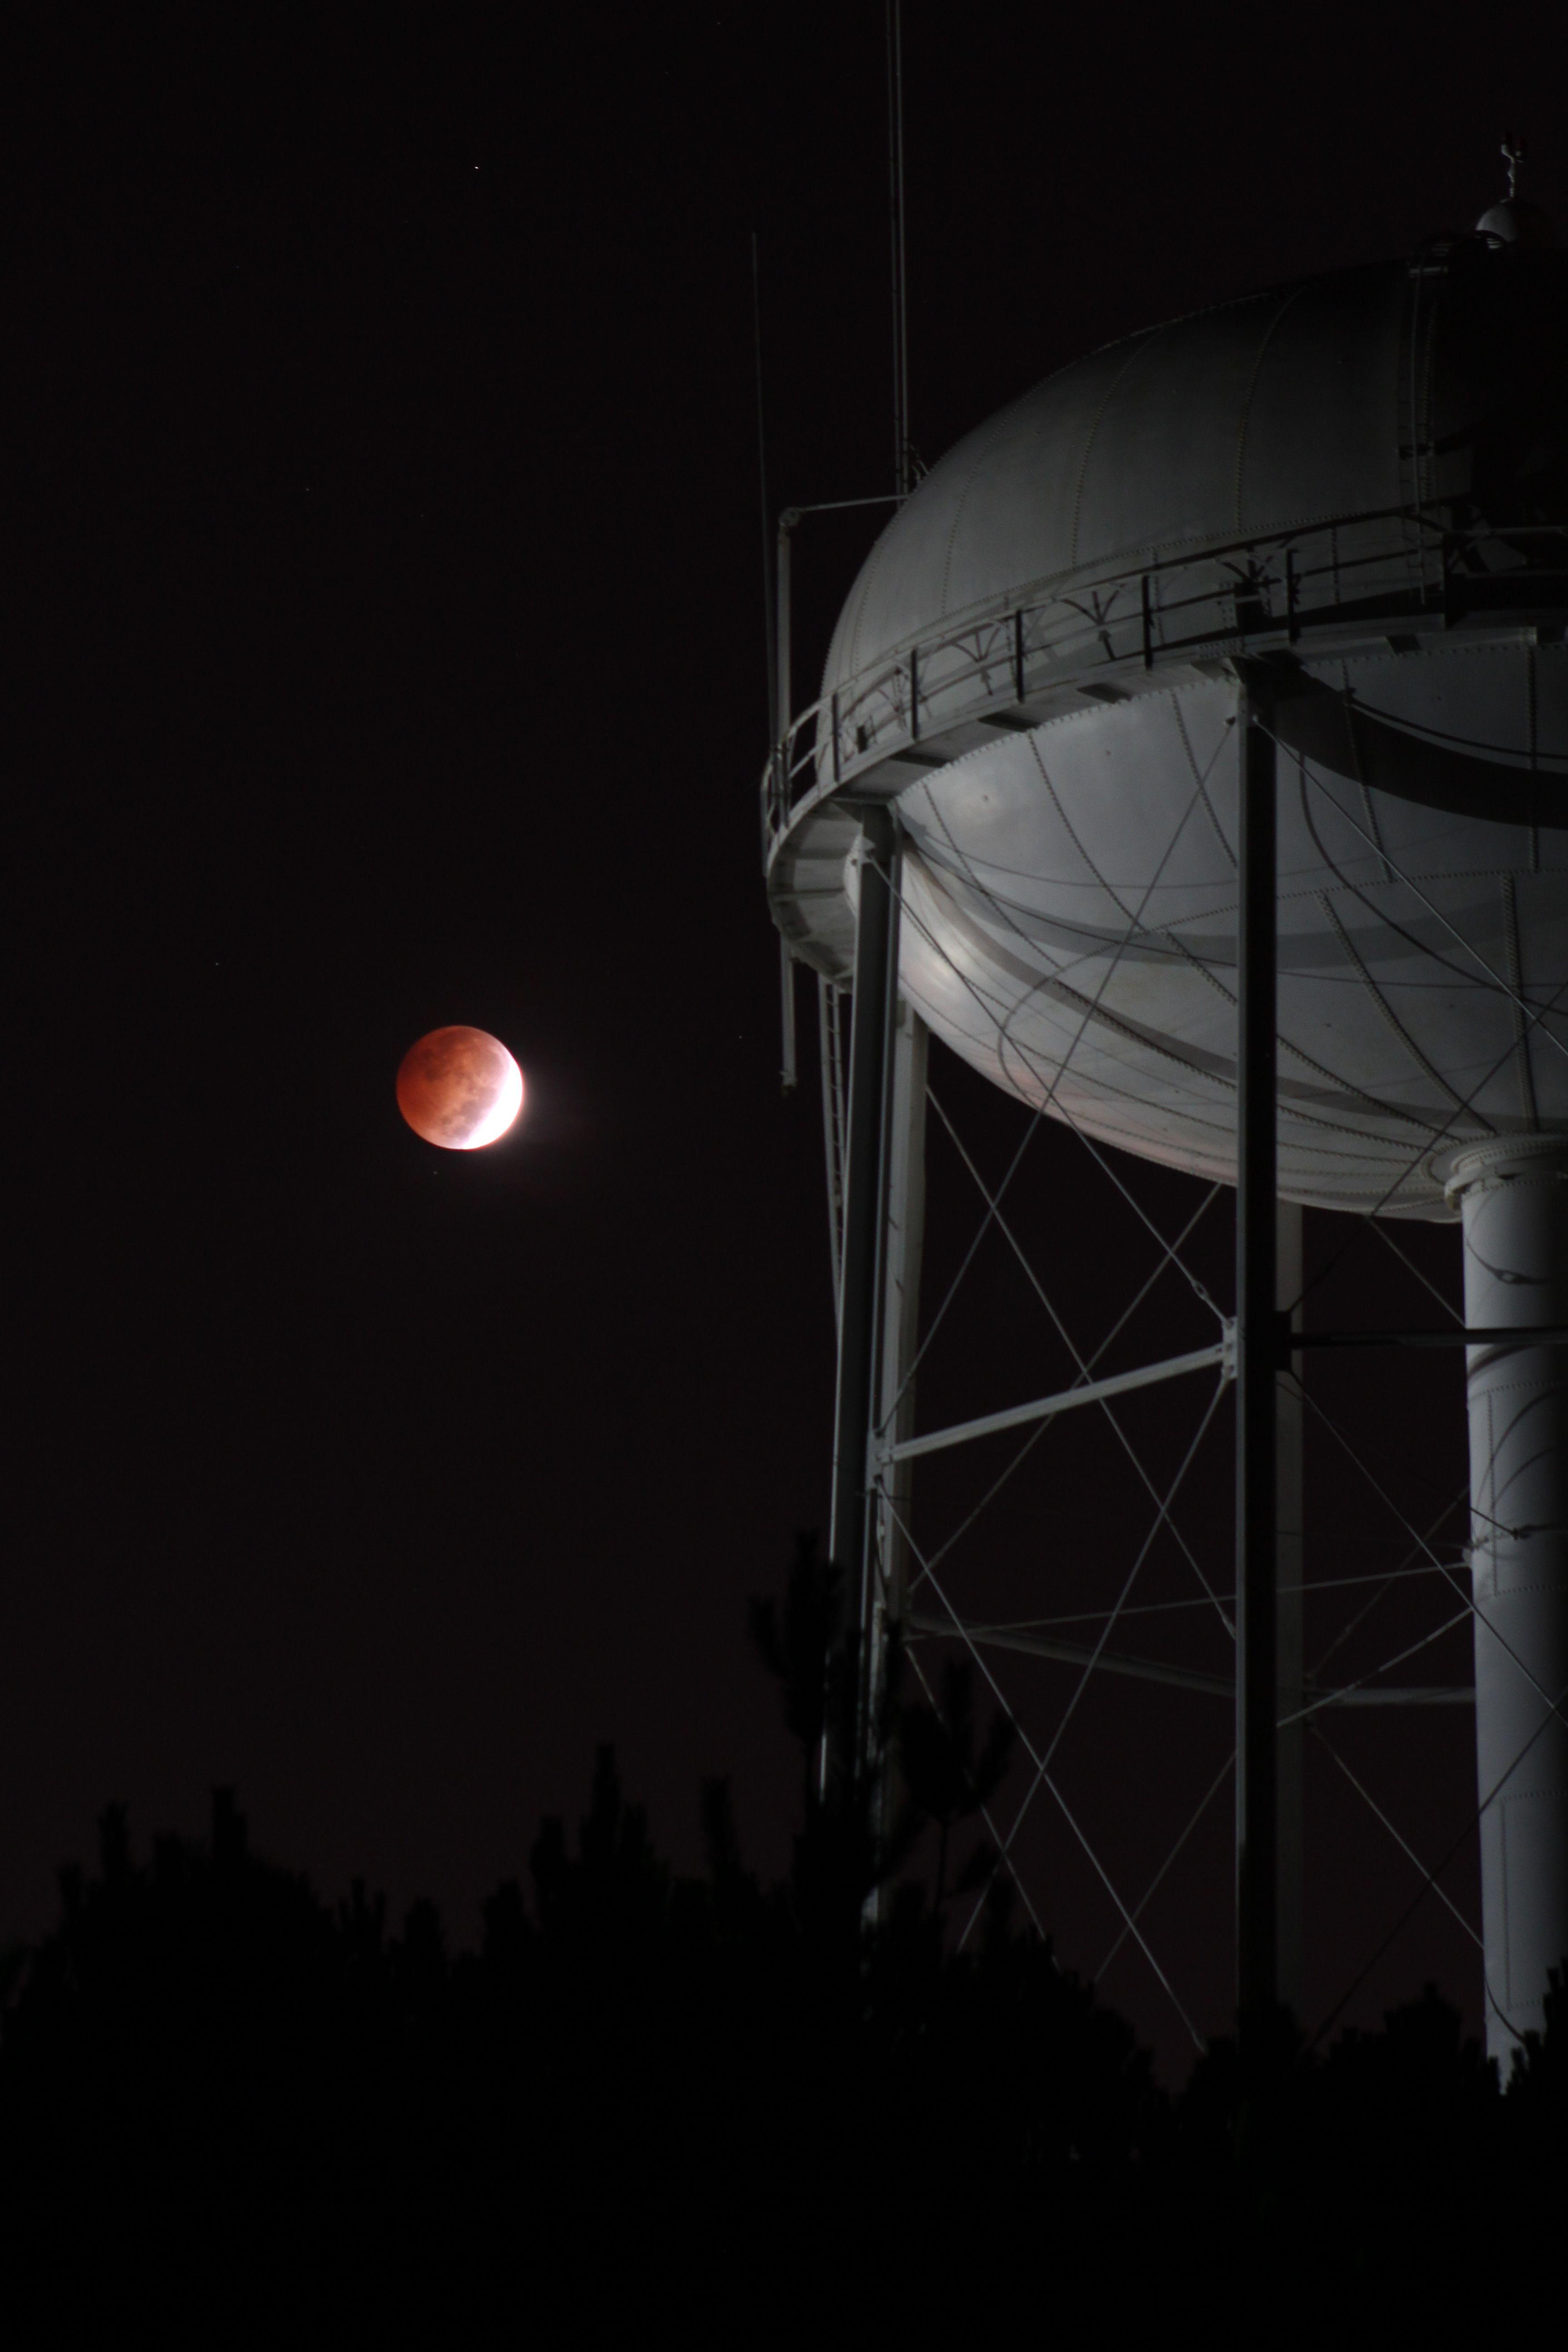 Blood Moon Total Lunar Eclipse Of Oct 8 2014 Photos